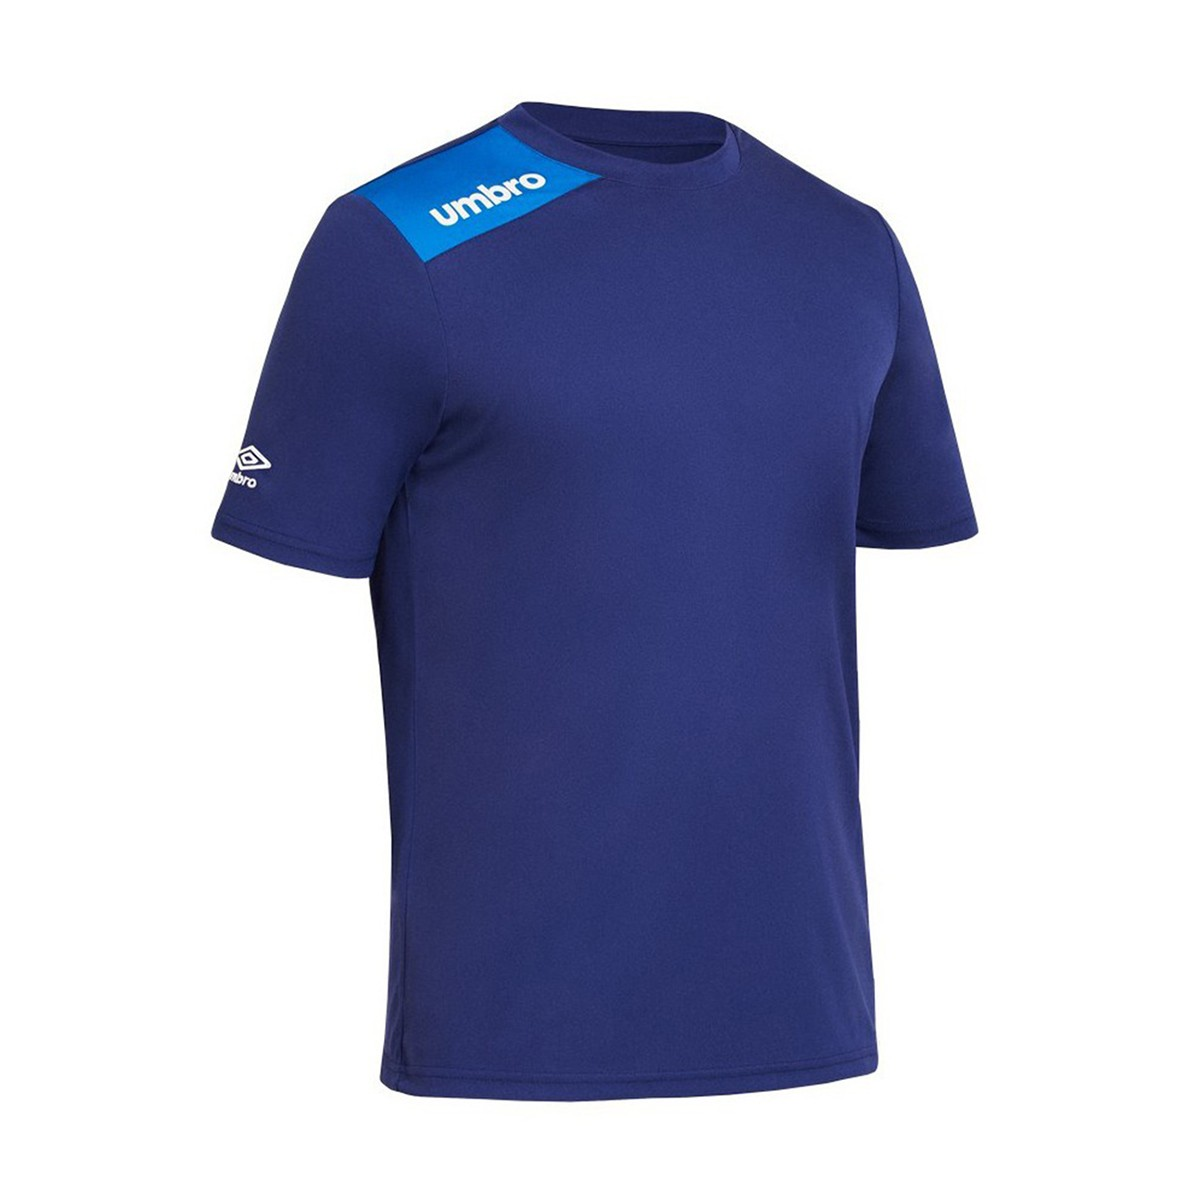 best service 2c6f4 76989 Camiseta Fight m/c Navy-Sky blue